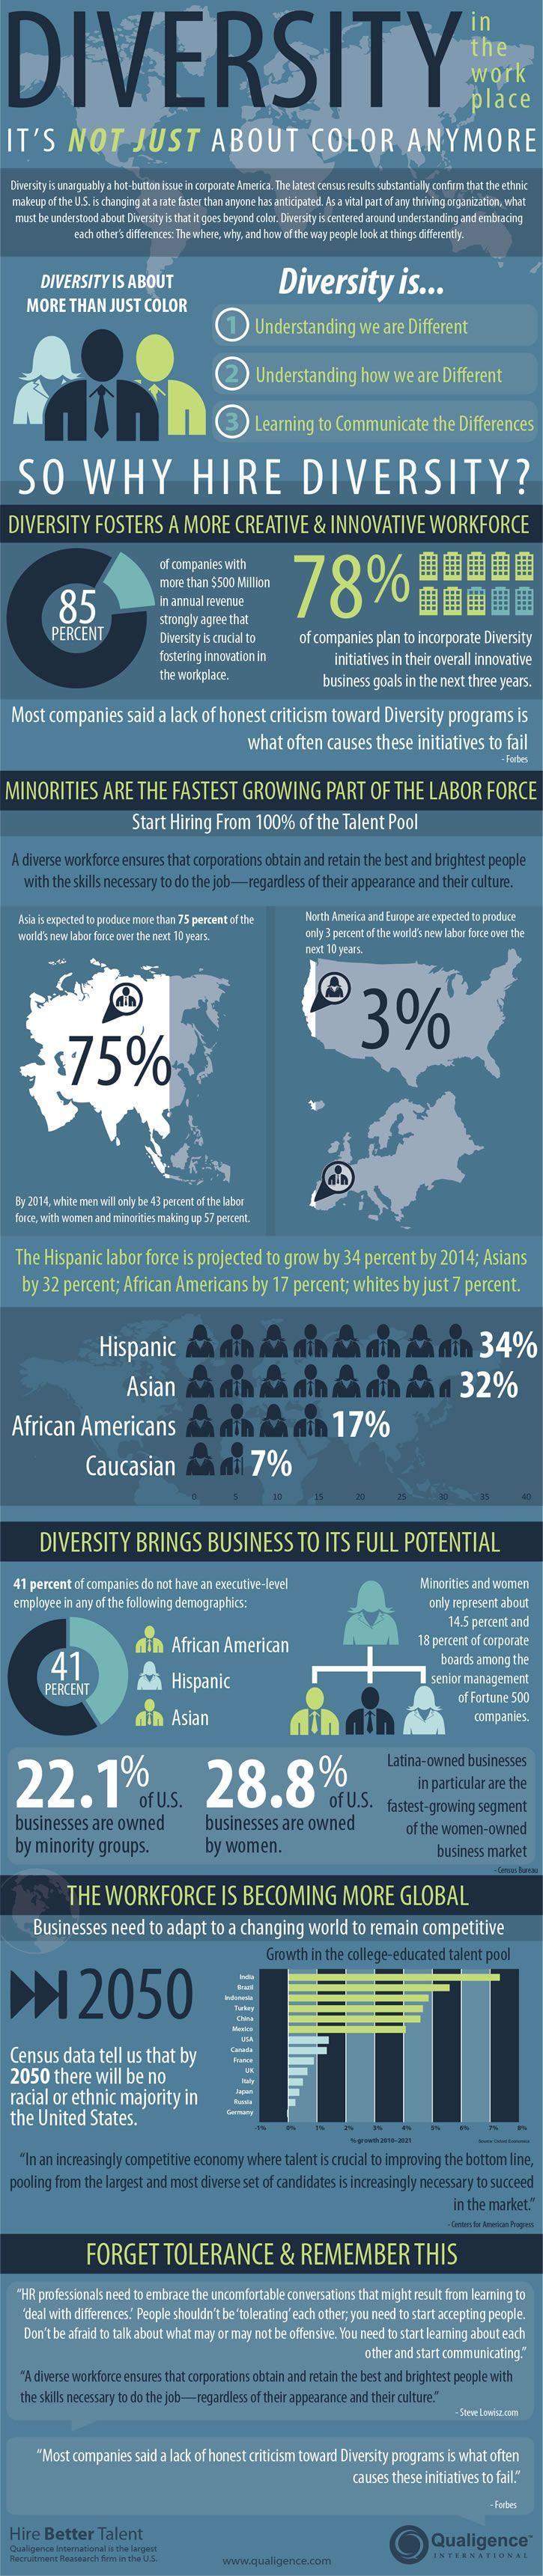 Infographic on Diversity